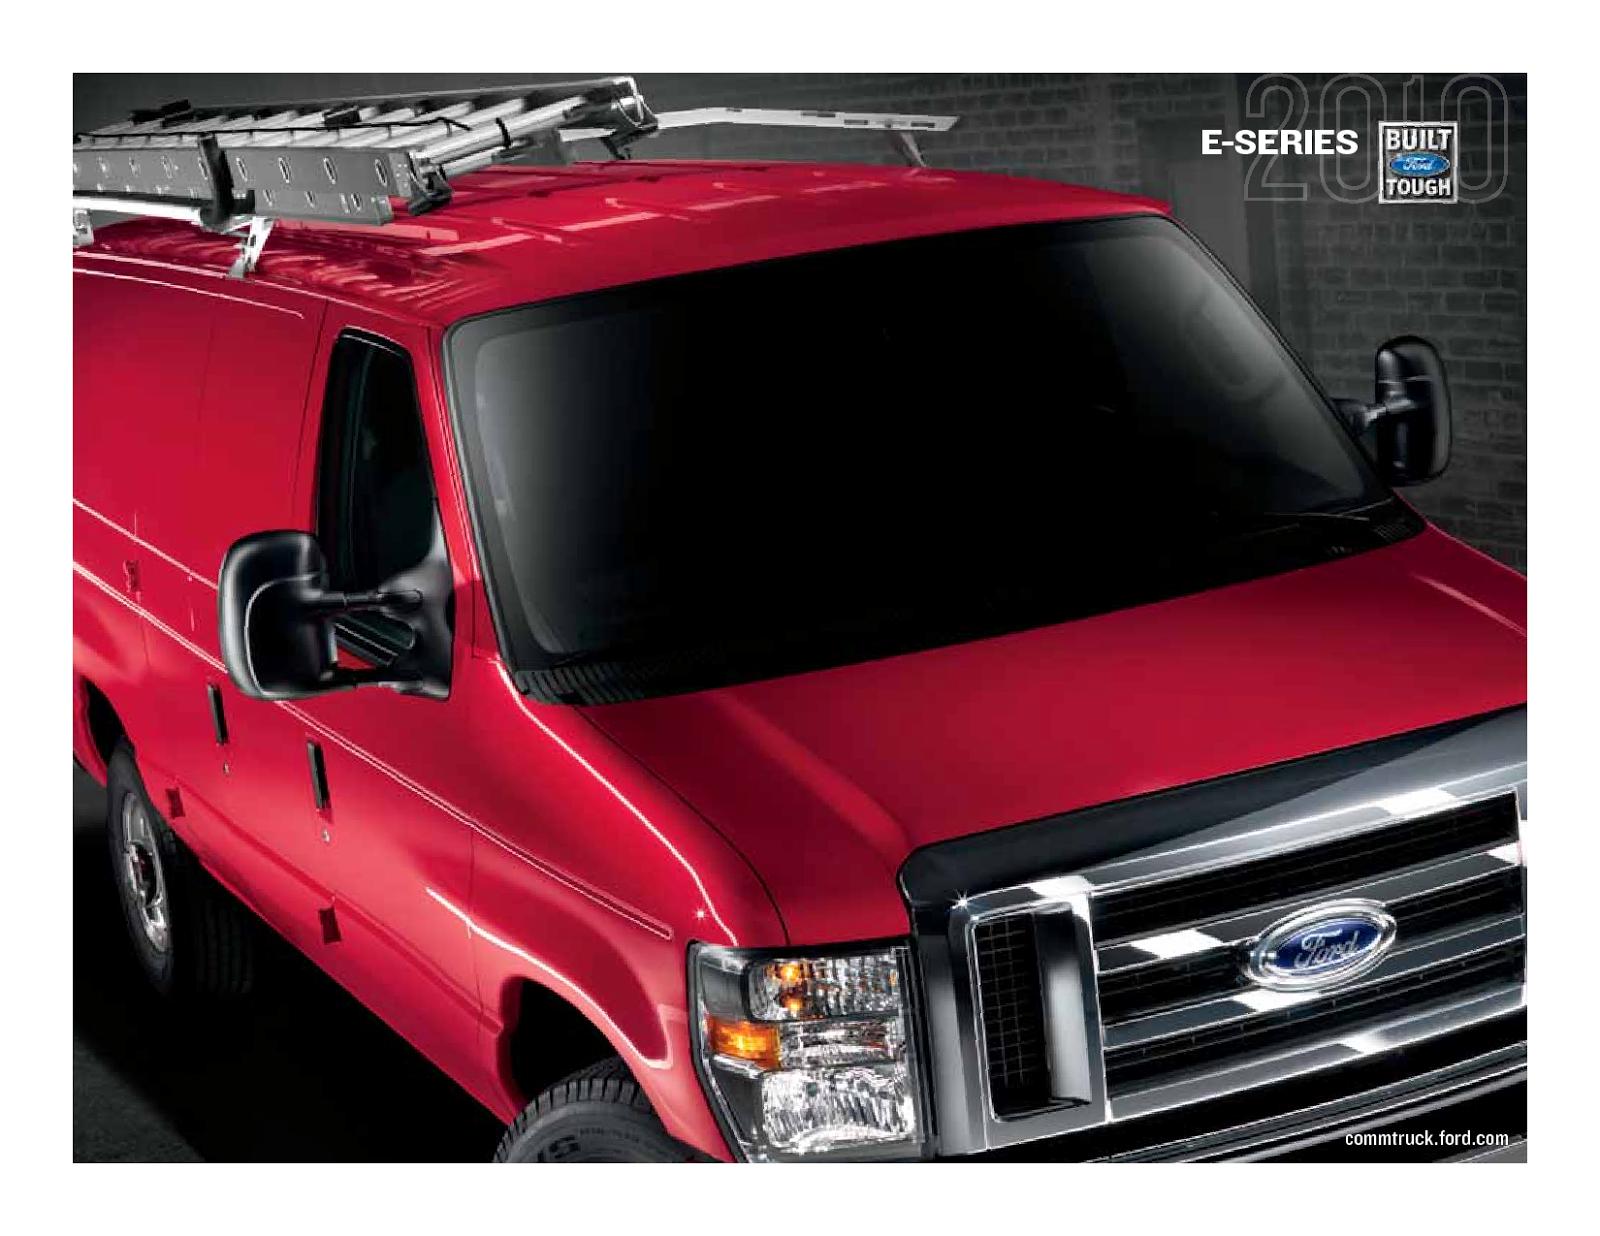 Gresham Ford Your Oregon Ford Dealership Ford S 2013